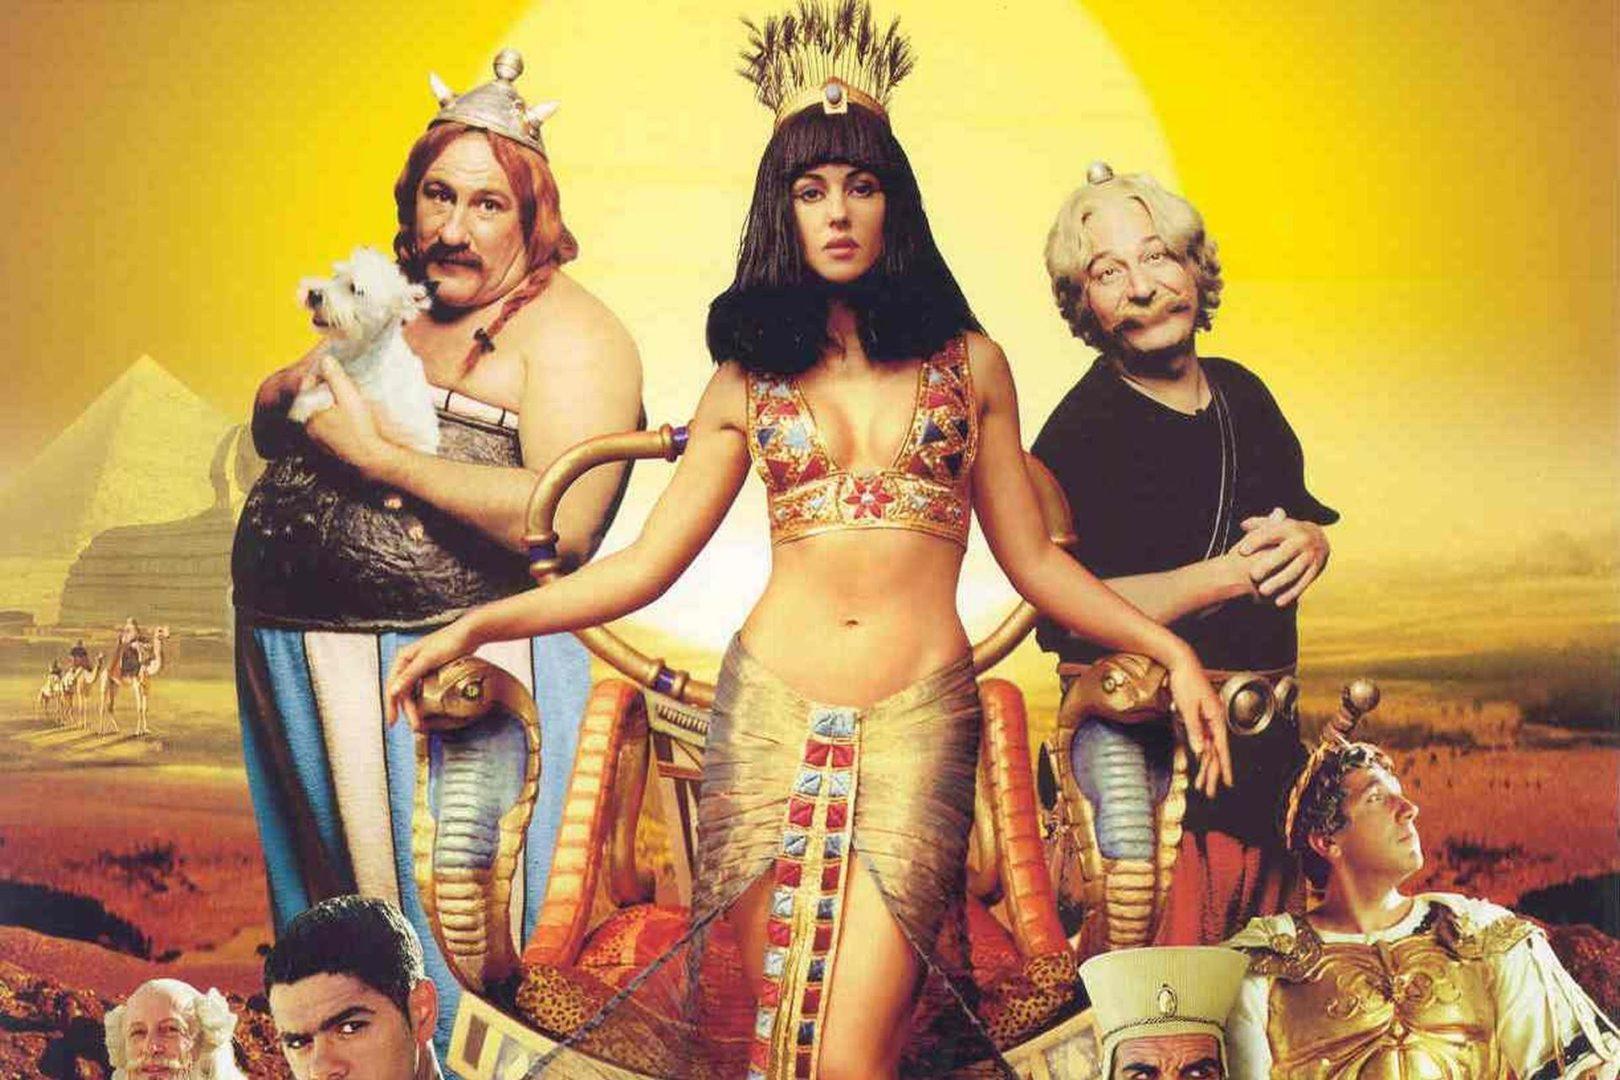 Клеопатра фото из фильма астерикс и обеликс